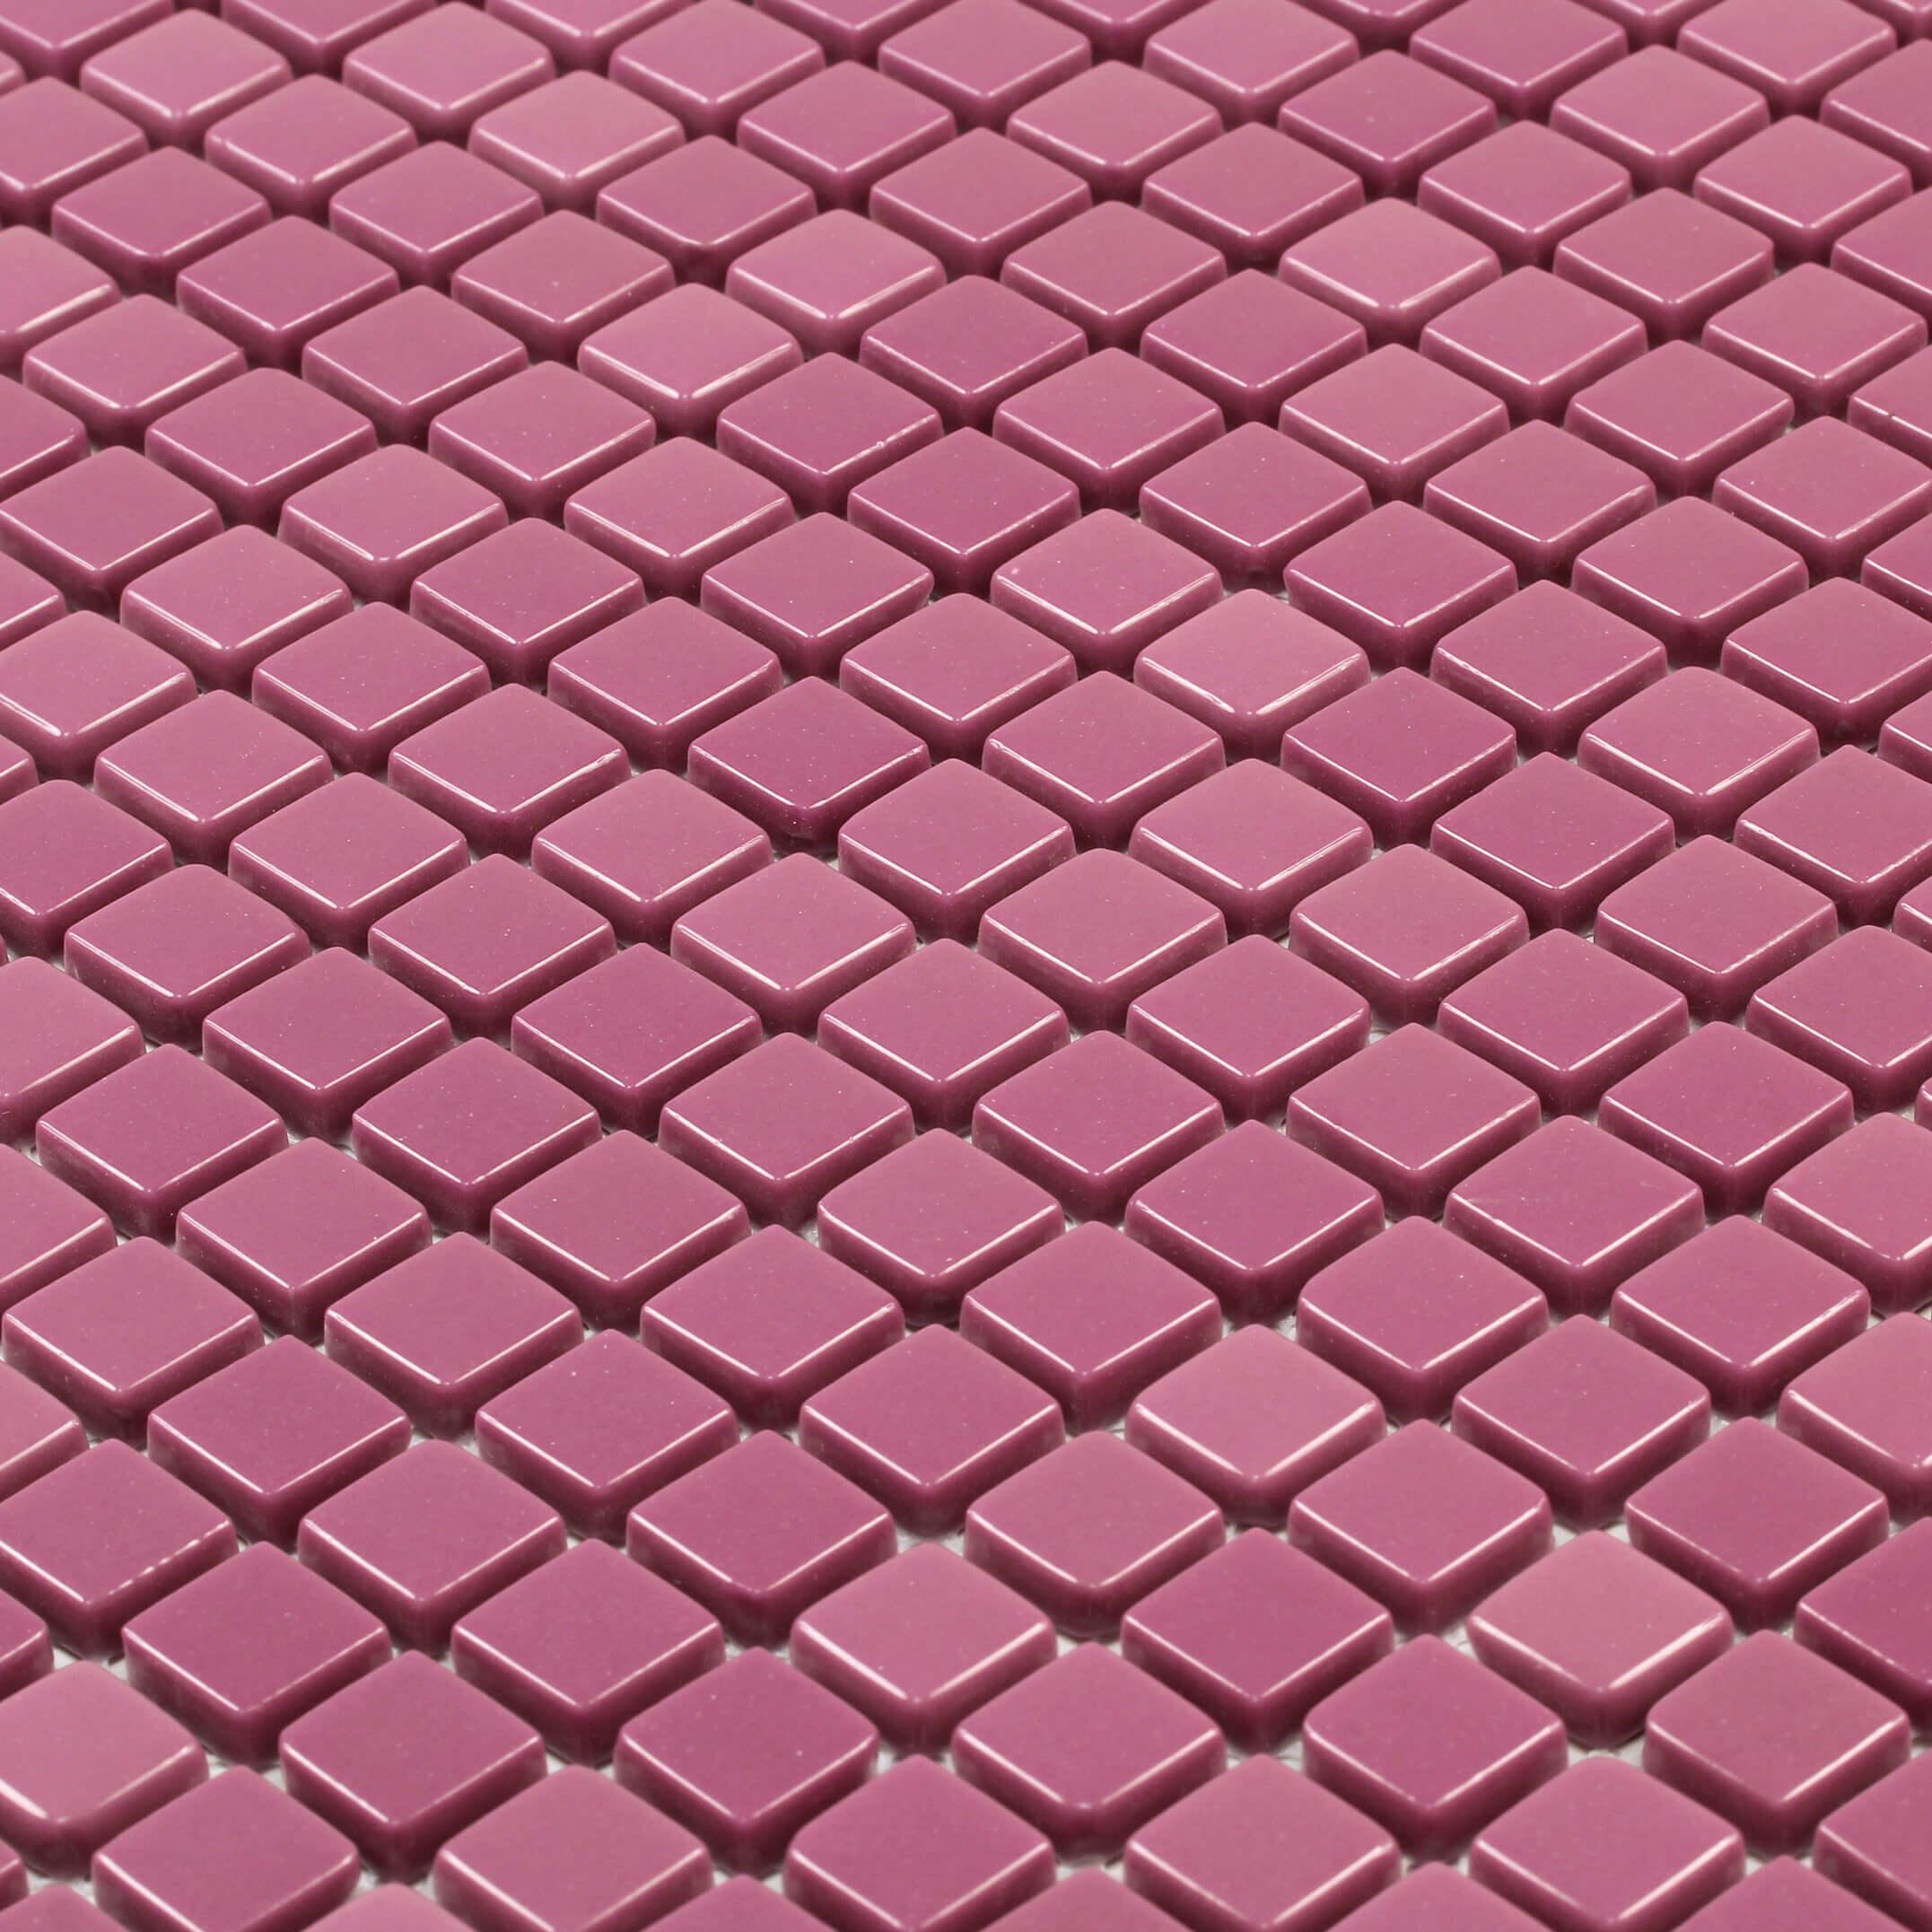 Mosaïque mur rose en verre Tunis brillant 30x30 cm